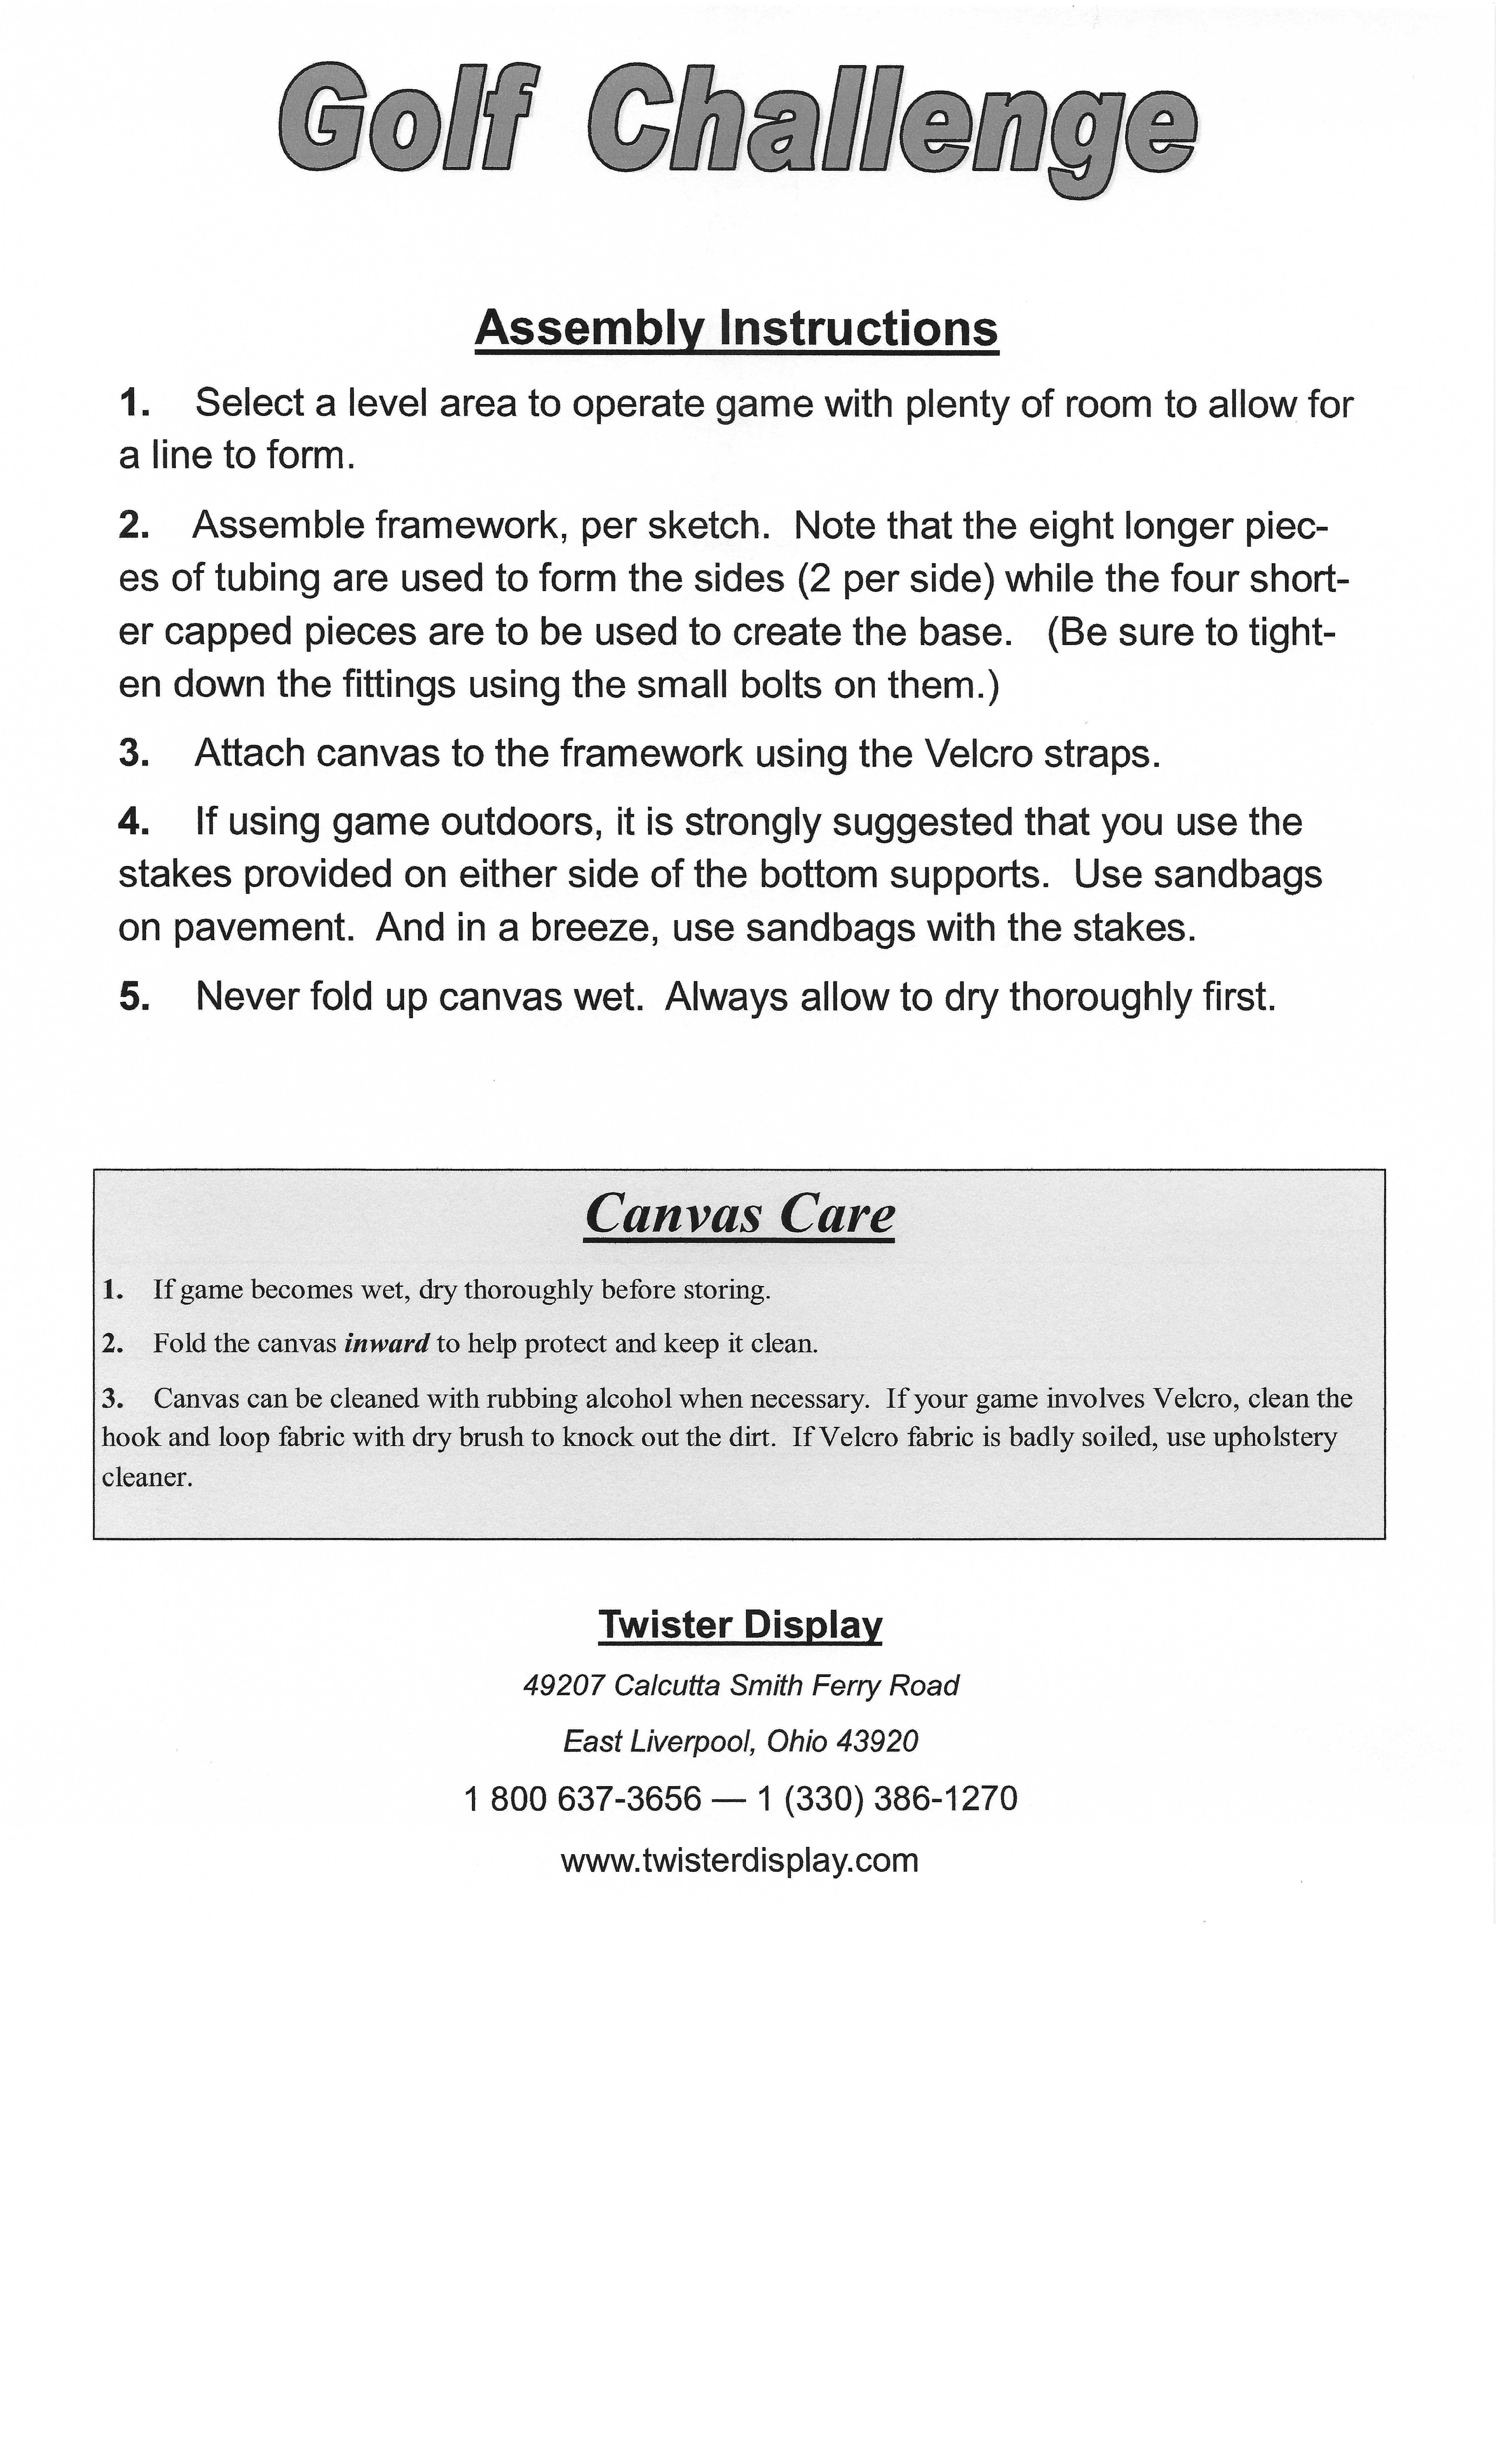 golf-chipping-challenge-instructions0002.jpg